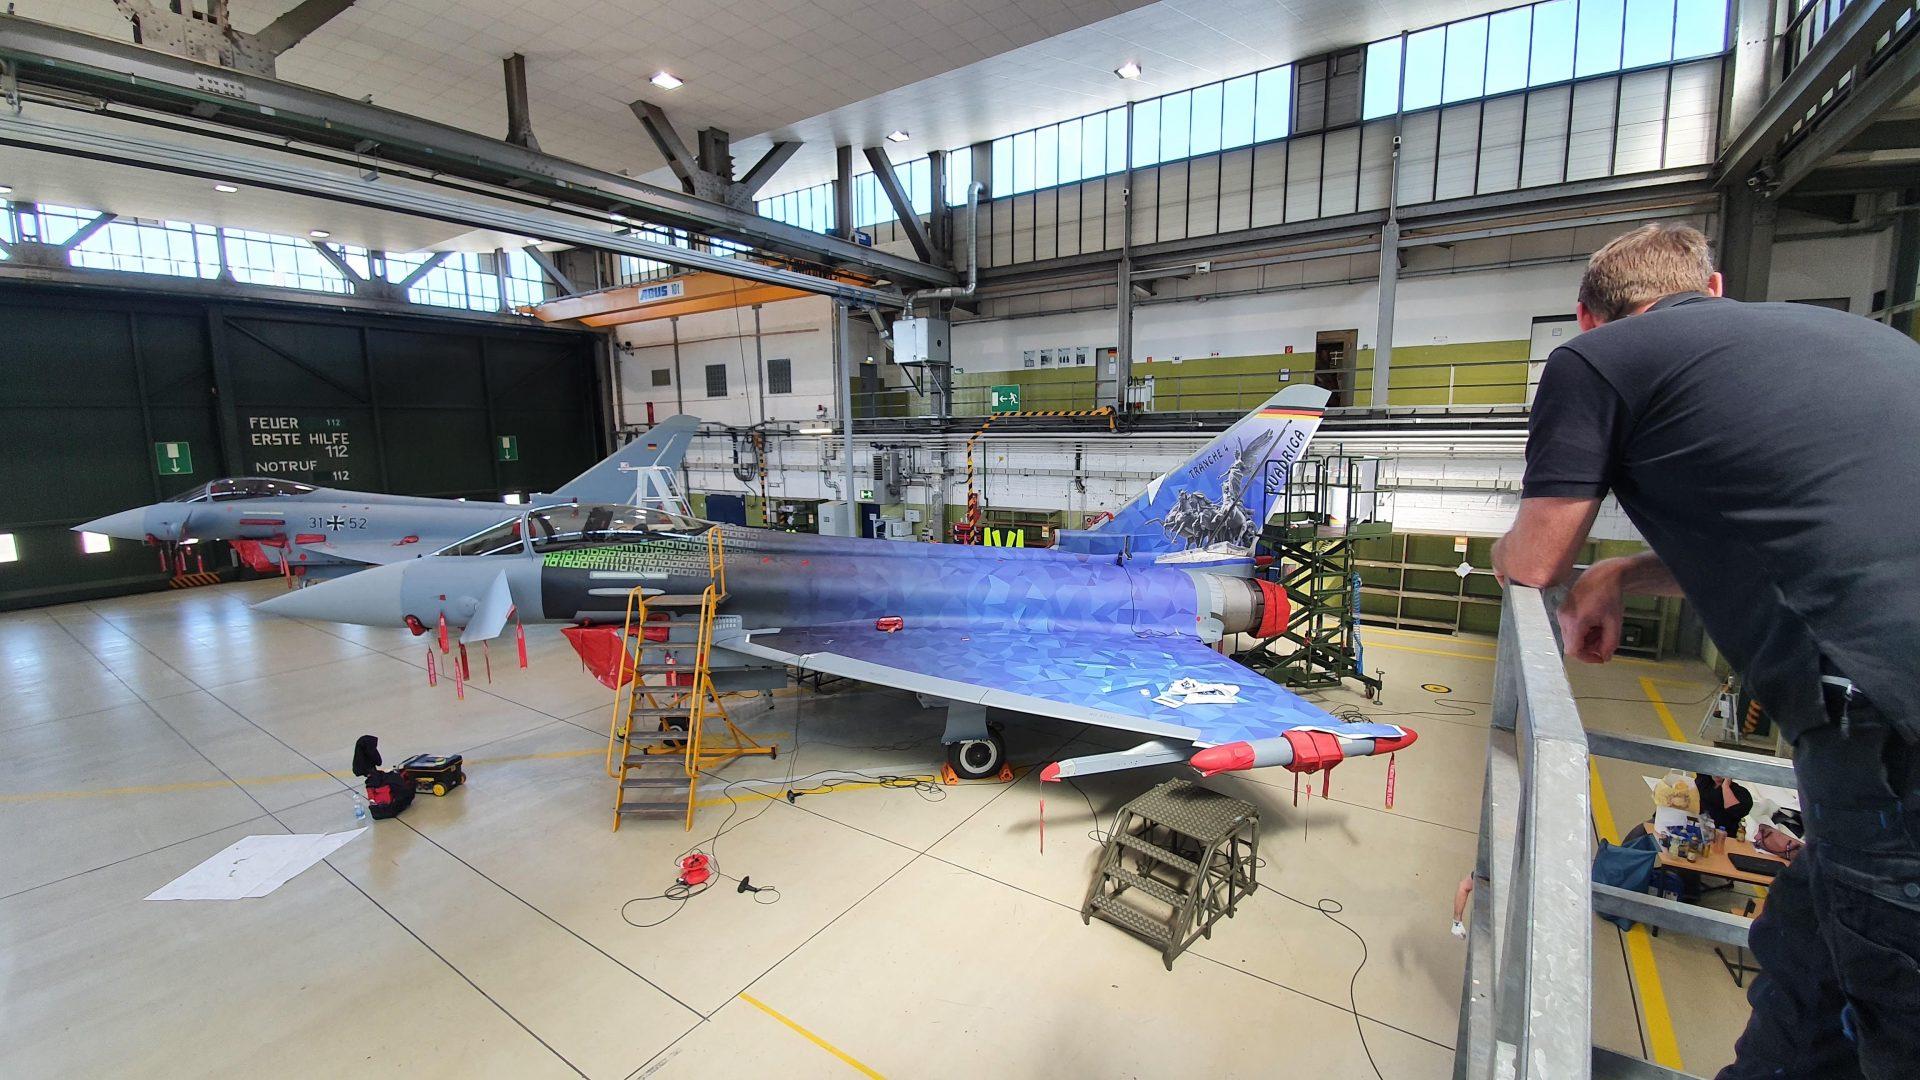 Eurofighter Folierung im Digtaldruck